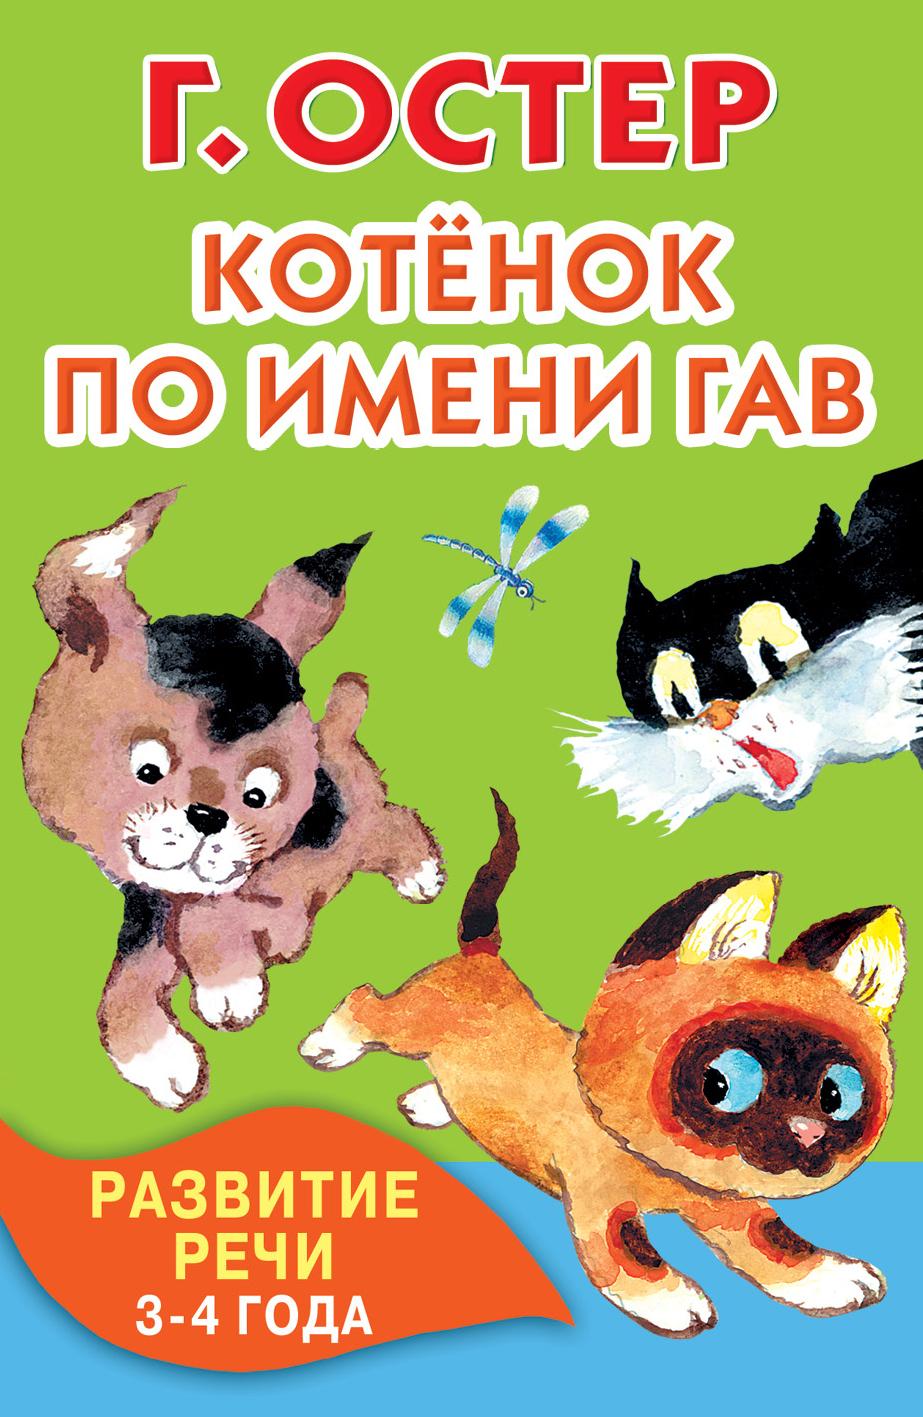 Котёнок по имени Гав. Развитие речи. 3-4 года ( Остер Г.Б.  )